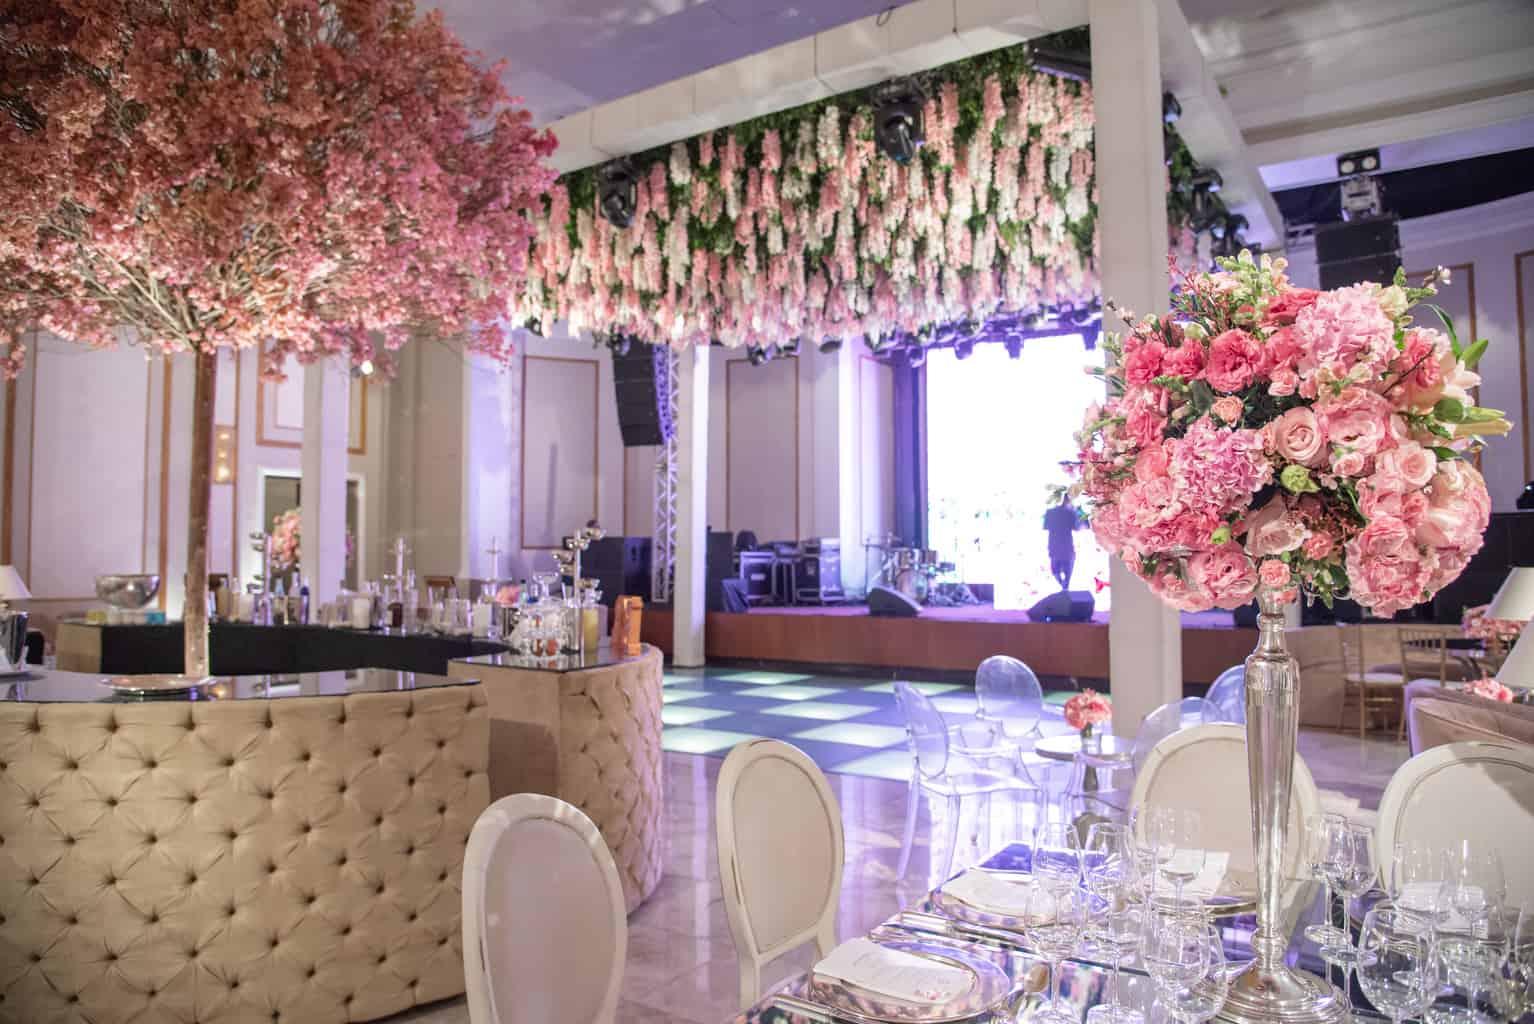 casamento-Patricia-e-Thiago-Copacabana-Palace-Daniel-Curz-A-Roseira-Paula-Rocha-Marina-Fava-decor1038-Patricia-e-Thiago-DSC_6021